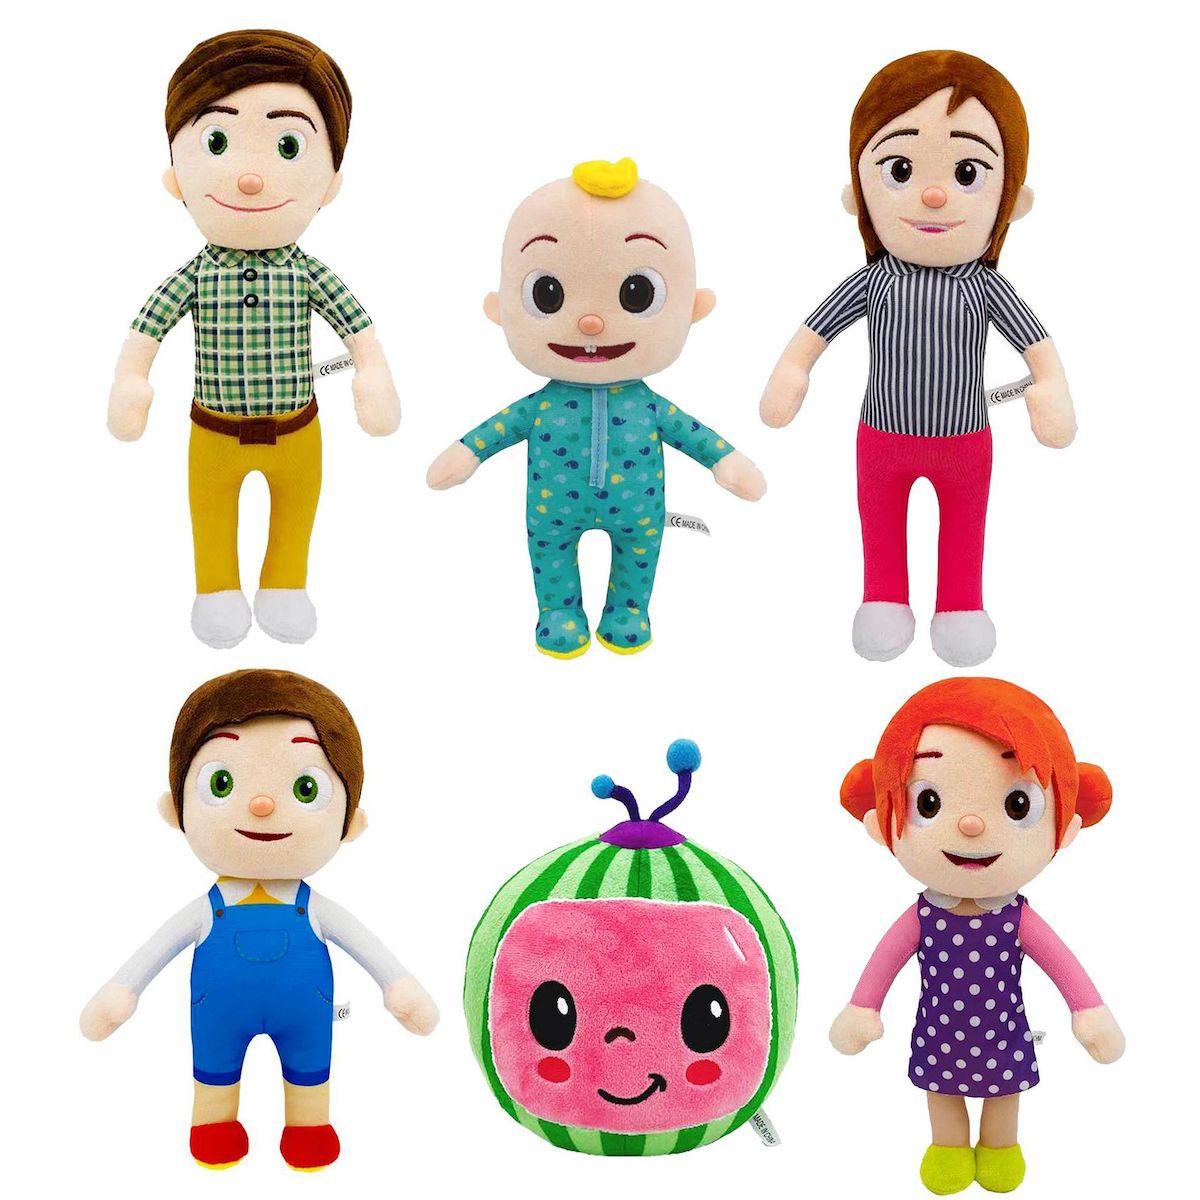 Stuffed Cocomelon Family Plush Dolls